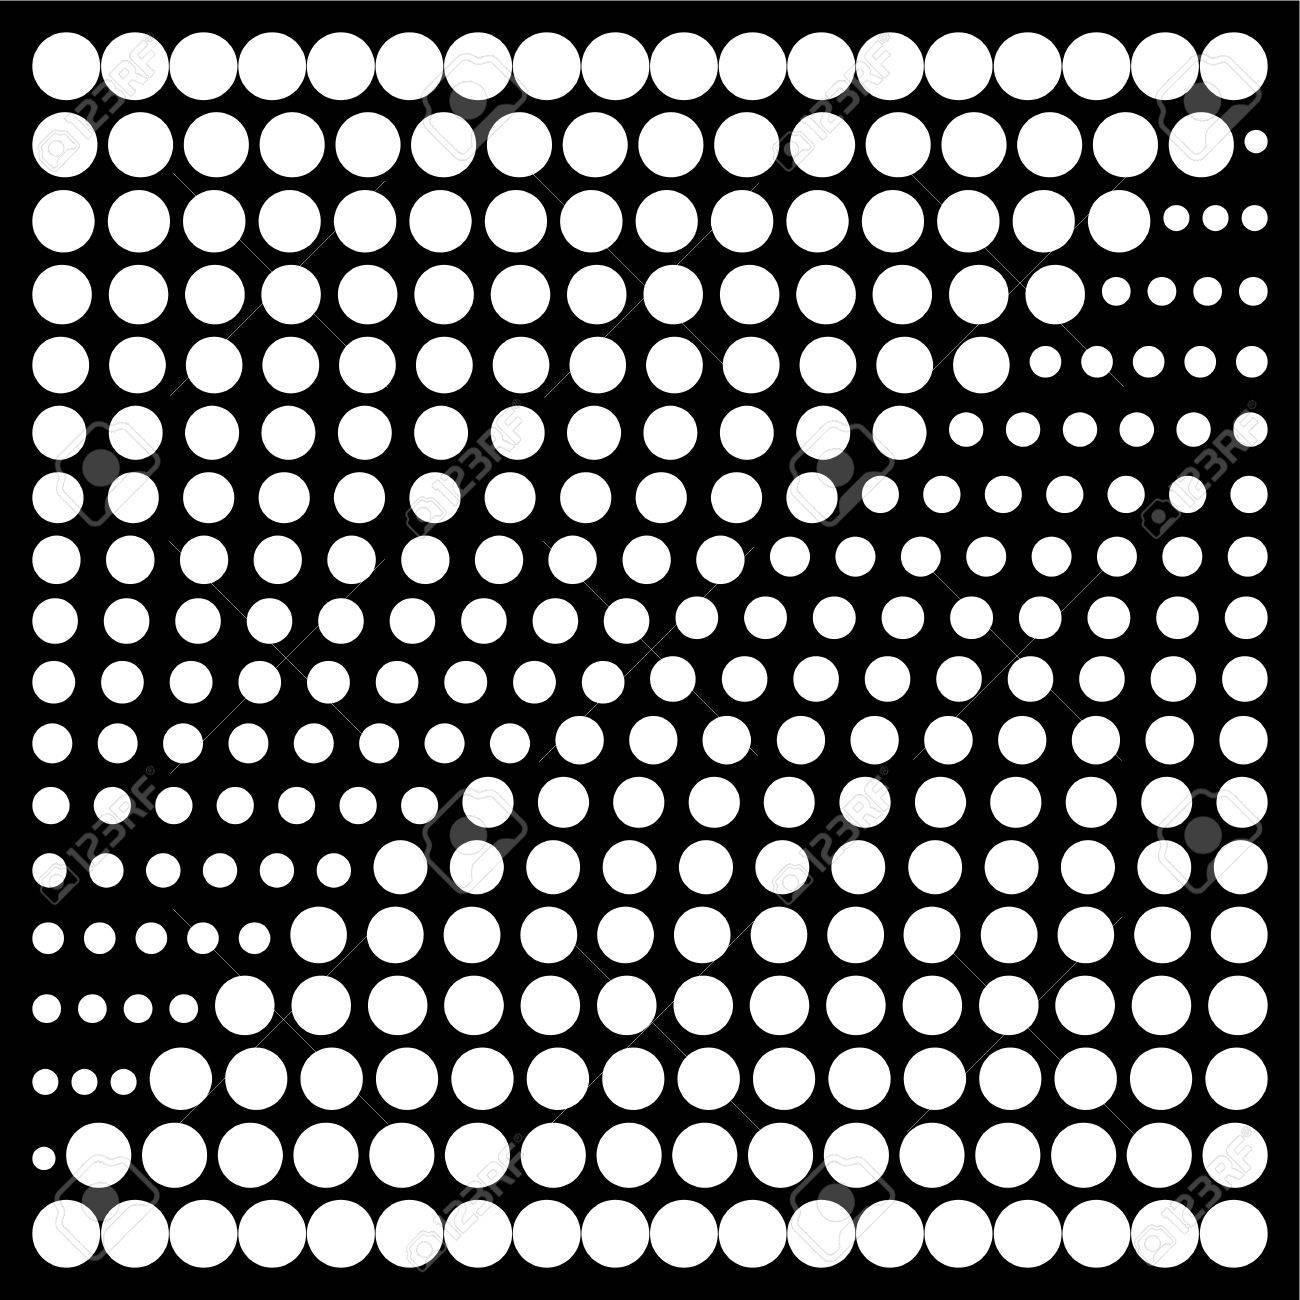 Halftone Design Elements Dot Pattern Dots Background Halftone